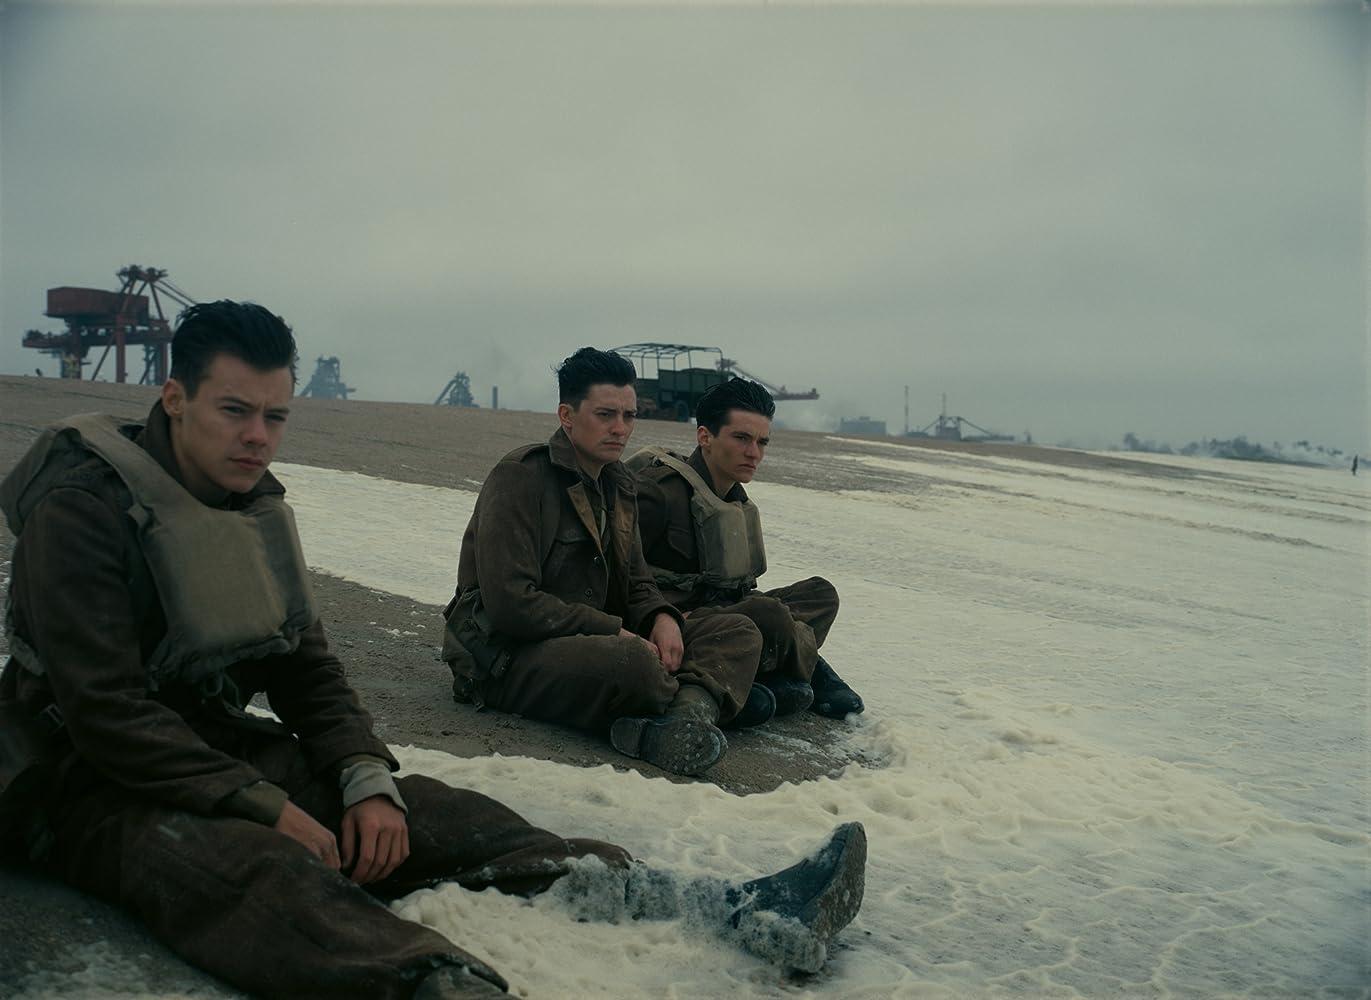 Aneurin Barnard, Harry Styles, and Fionn Whitehead in Dunkirk (2017)